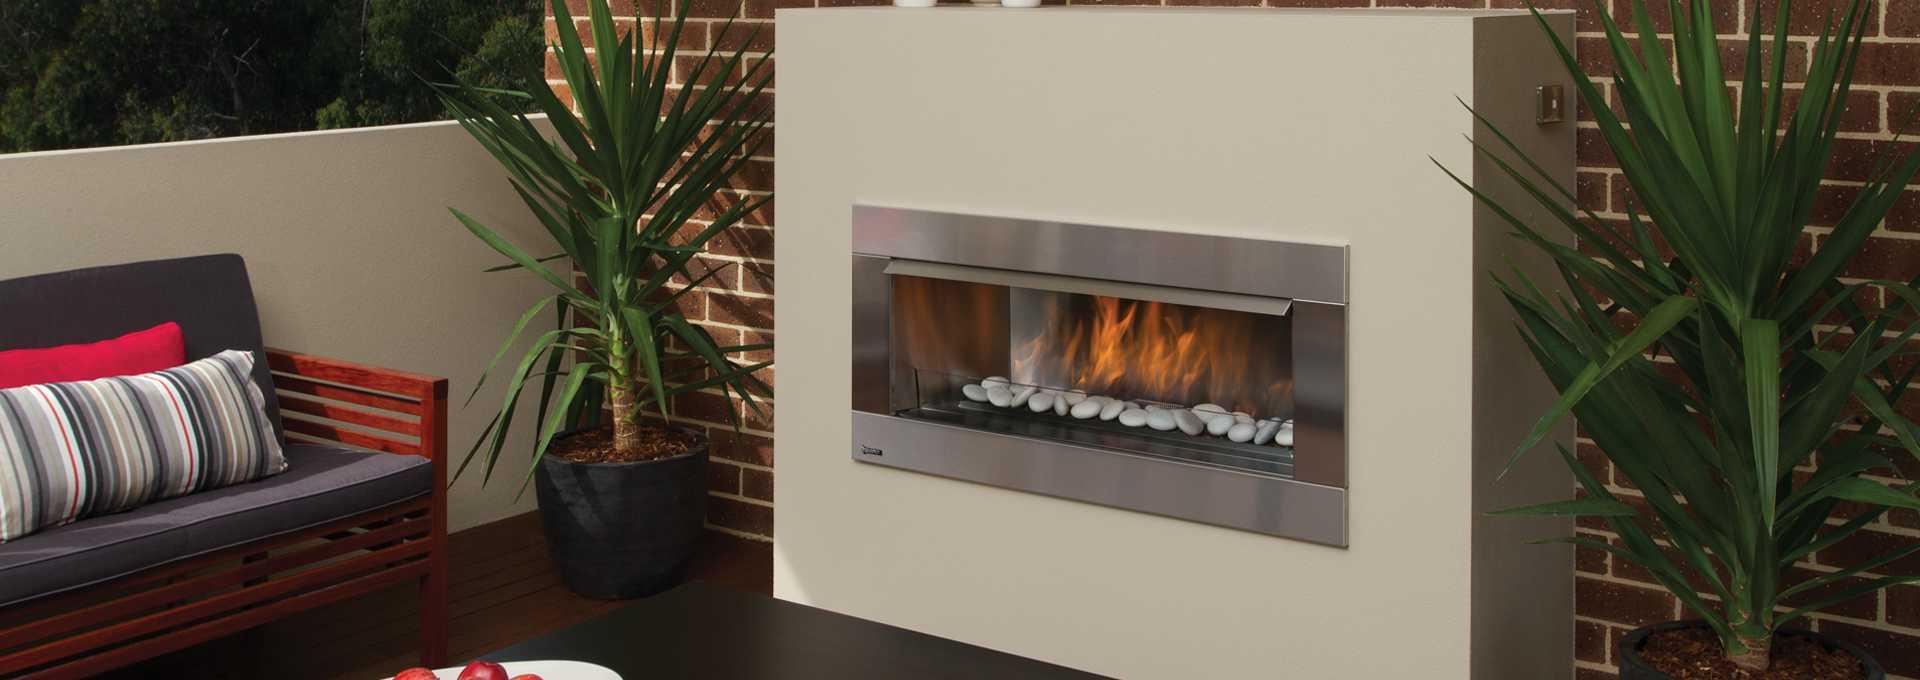 gemfire hzo42 outdoor gas fire regency fireplace products australia